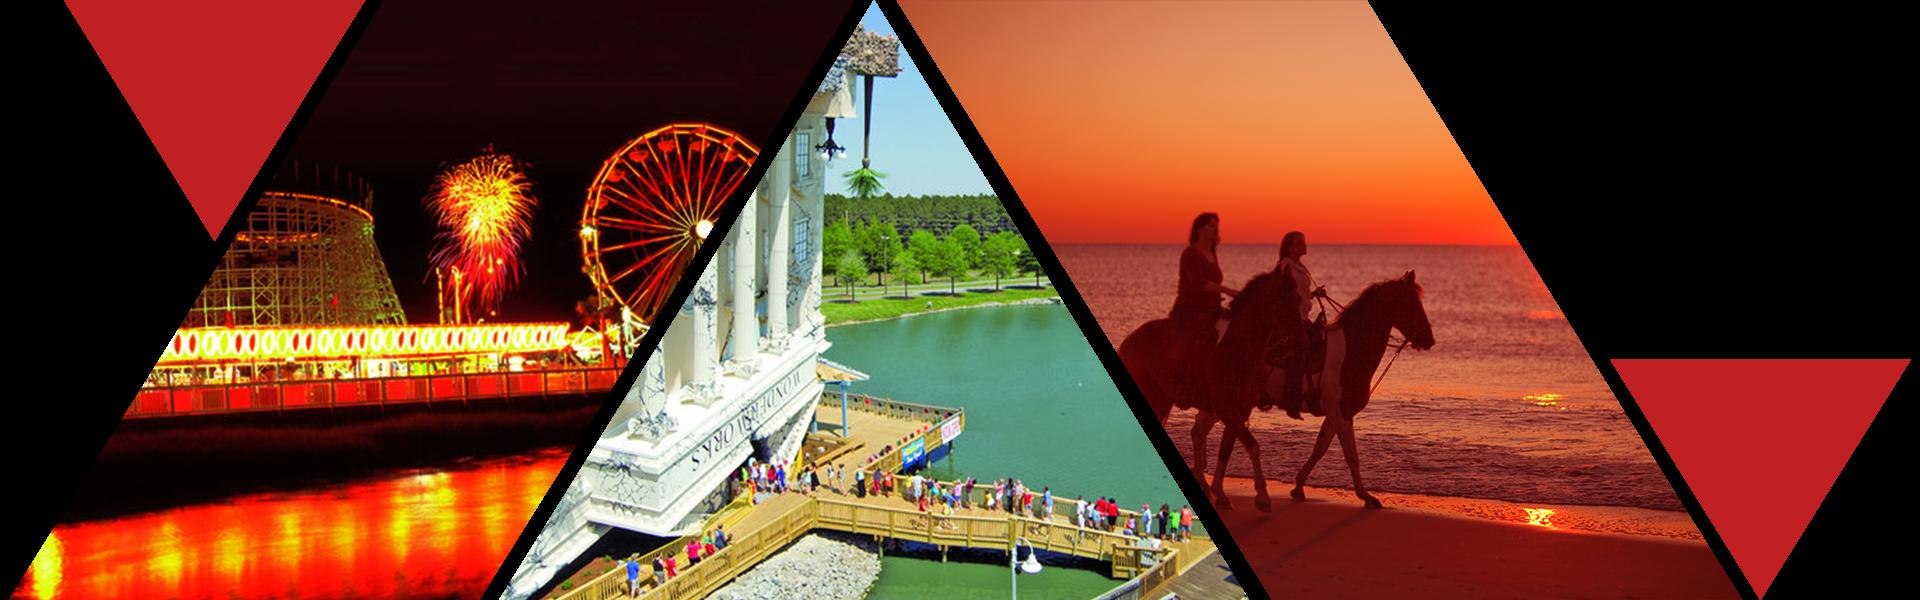 Spring break destinations: Myrtle Beach, South Carolina